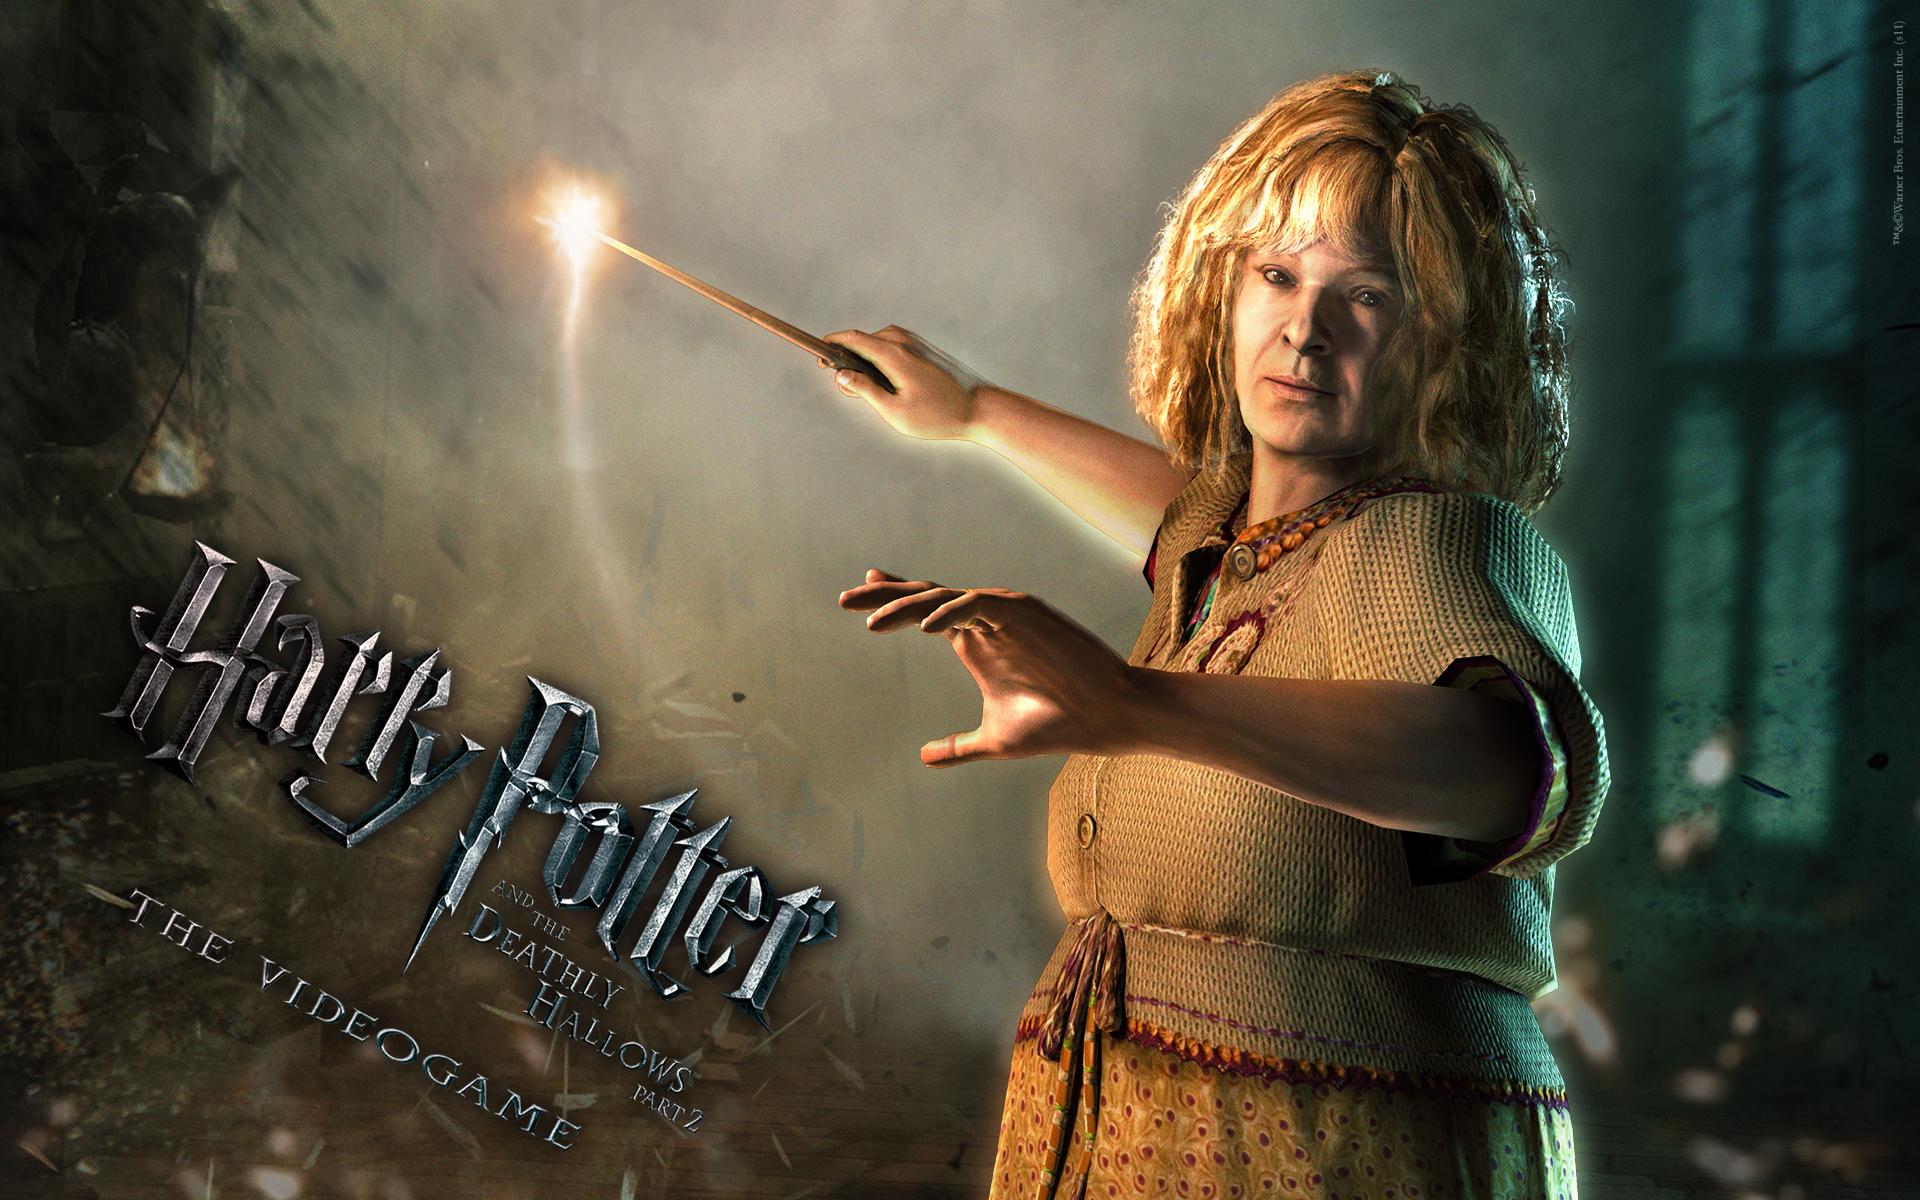 Beautiful Wallpaper Harry Potter Deathly Hallows - harry-potter-and-the-deathly-hallows-part-2-game-wallpaper-molly  Trends_39368.jpg